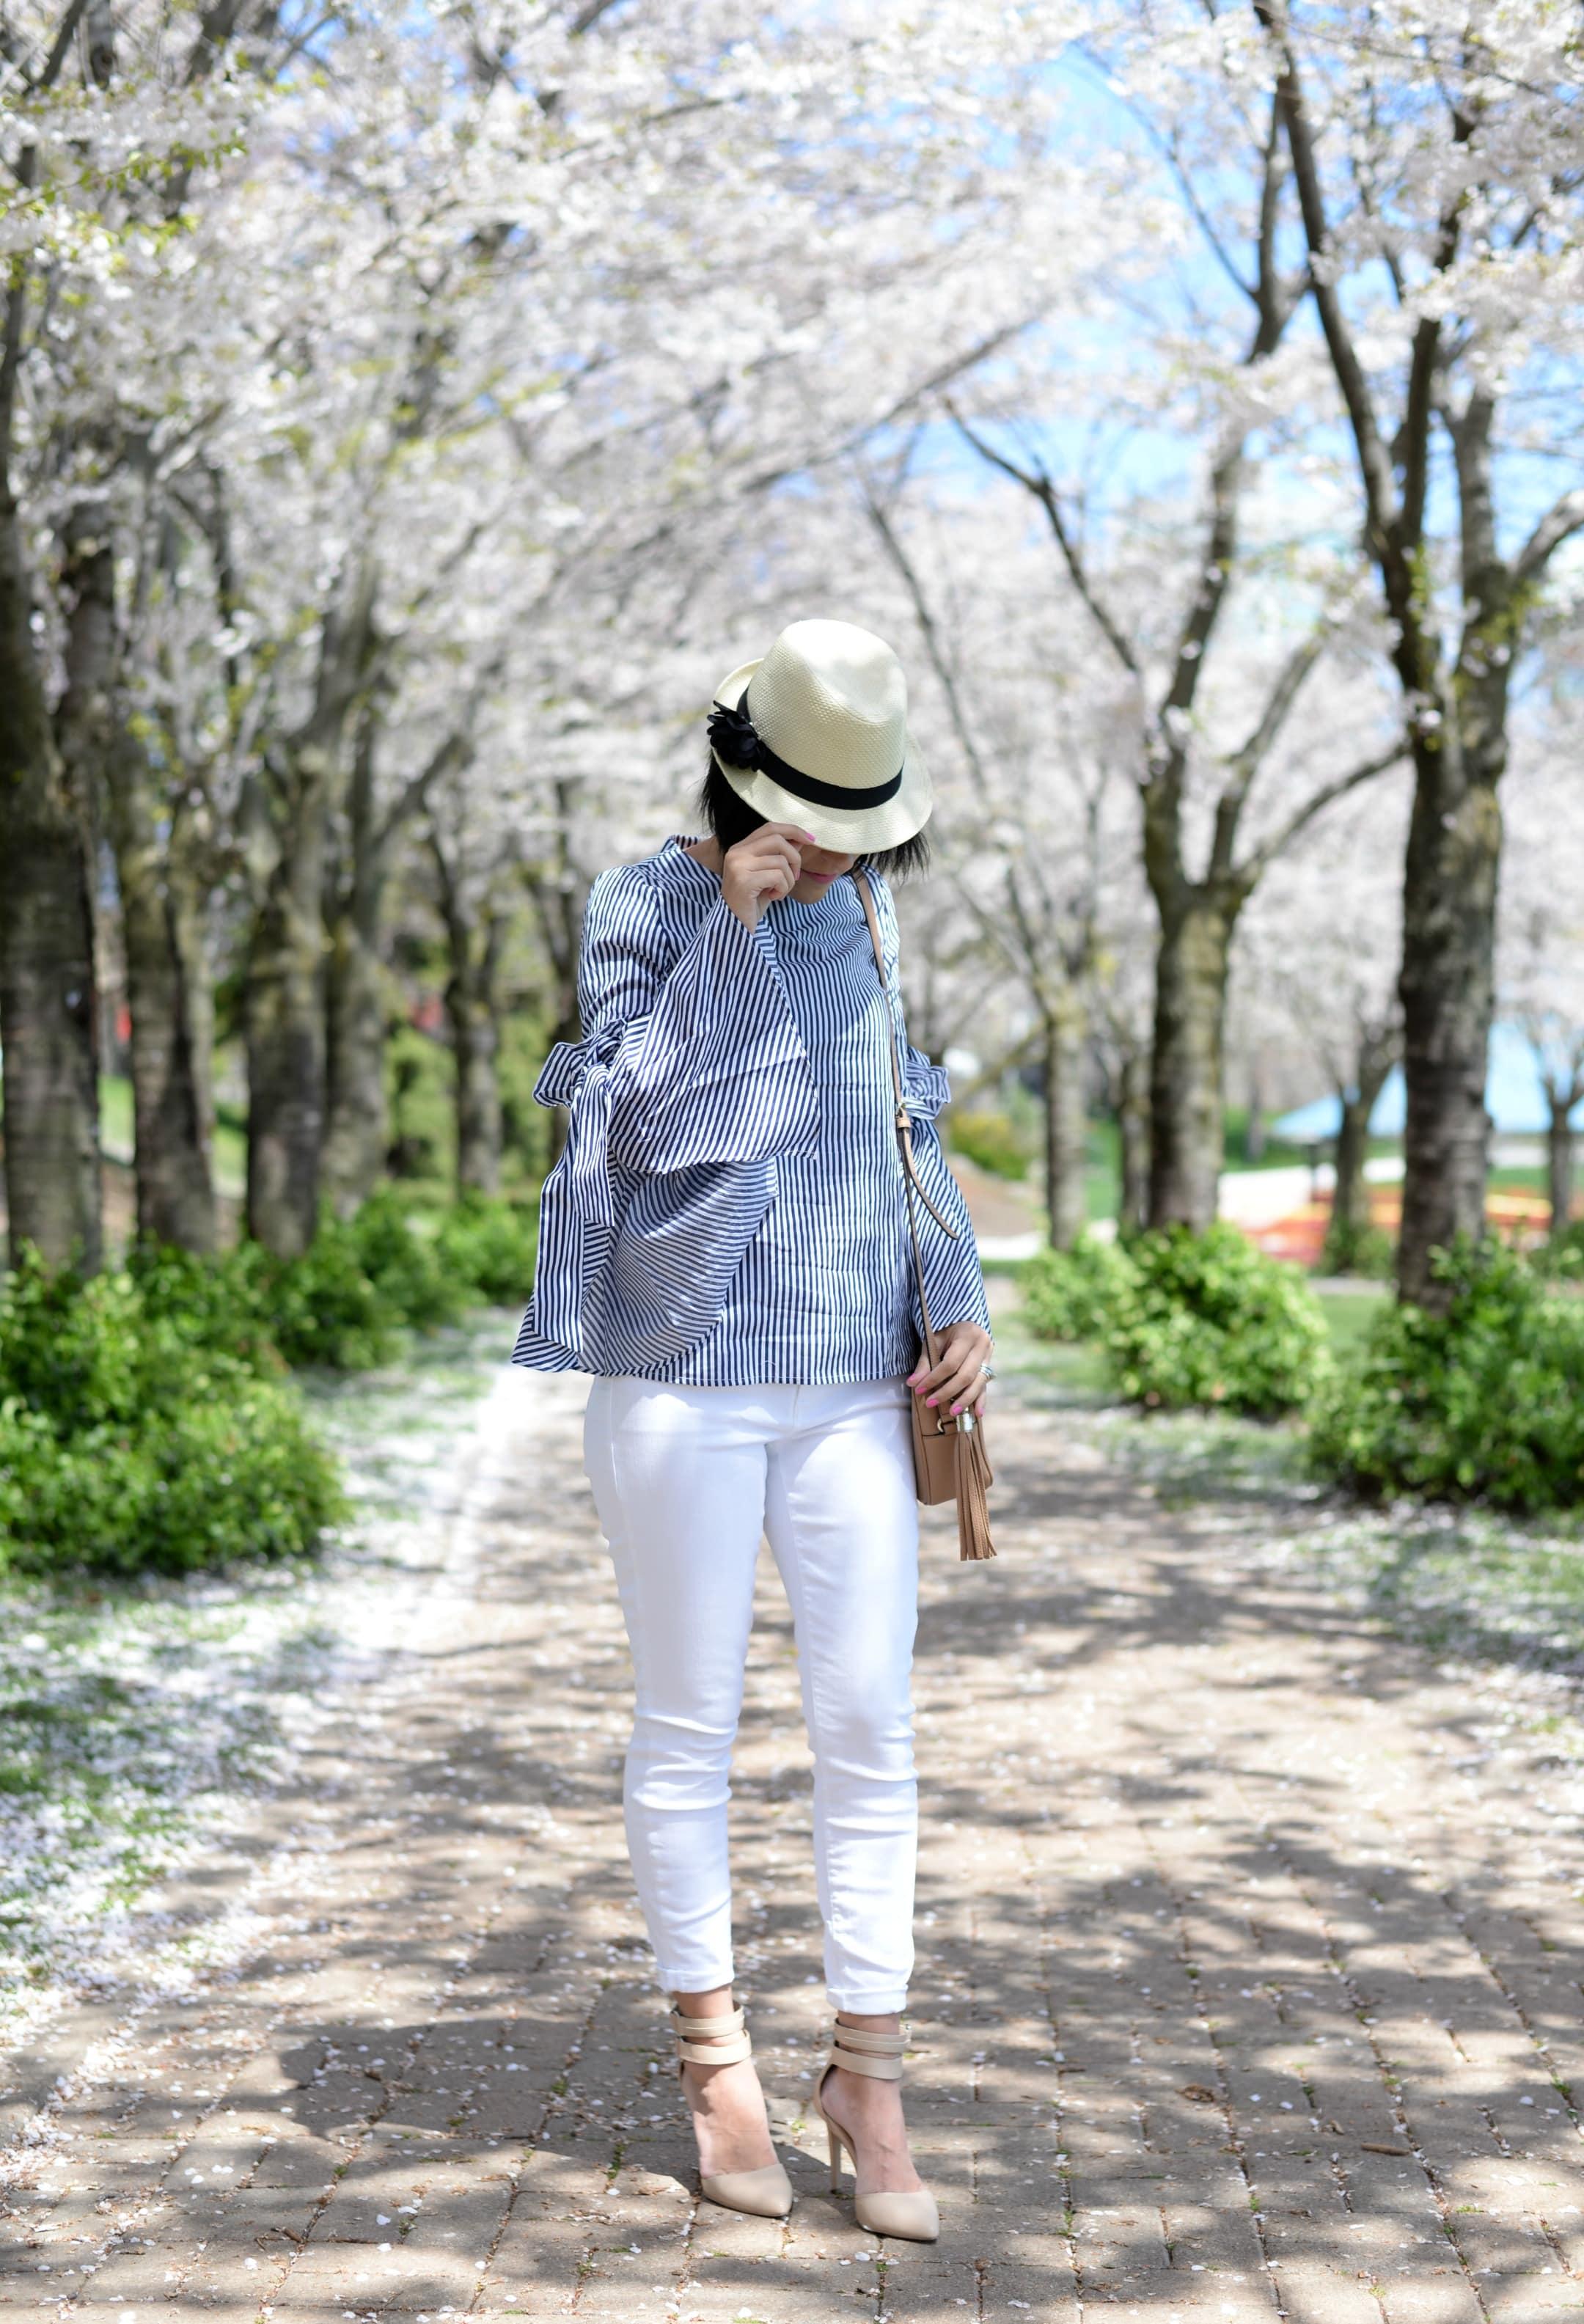 Daniel Wellington Classic Petite, style blog, blogger, fashion, best blogs, fashion style